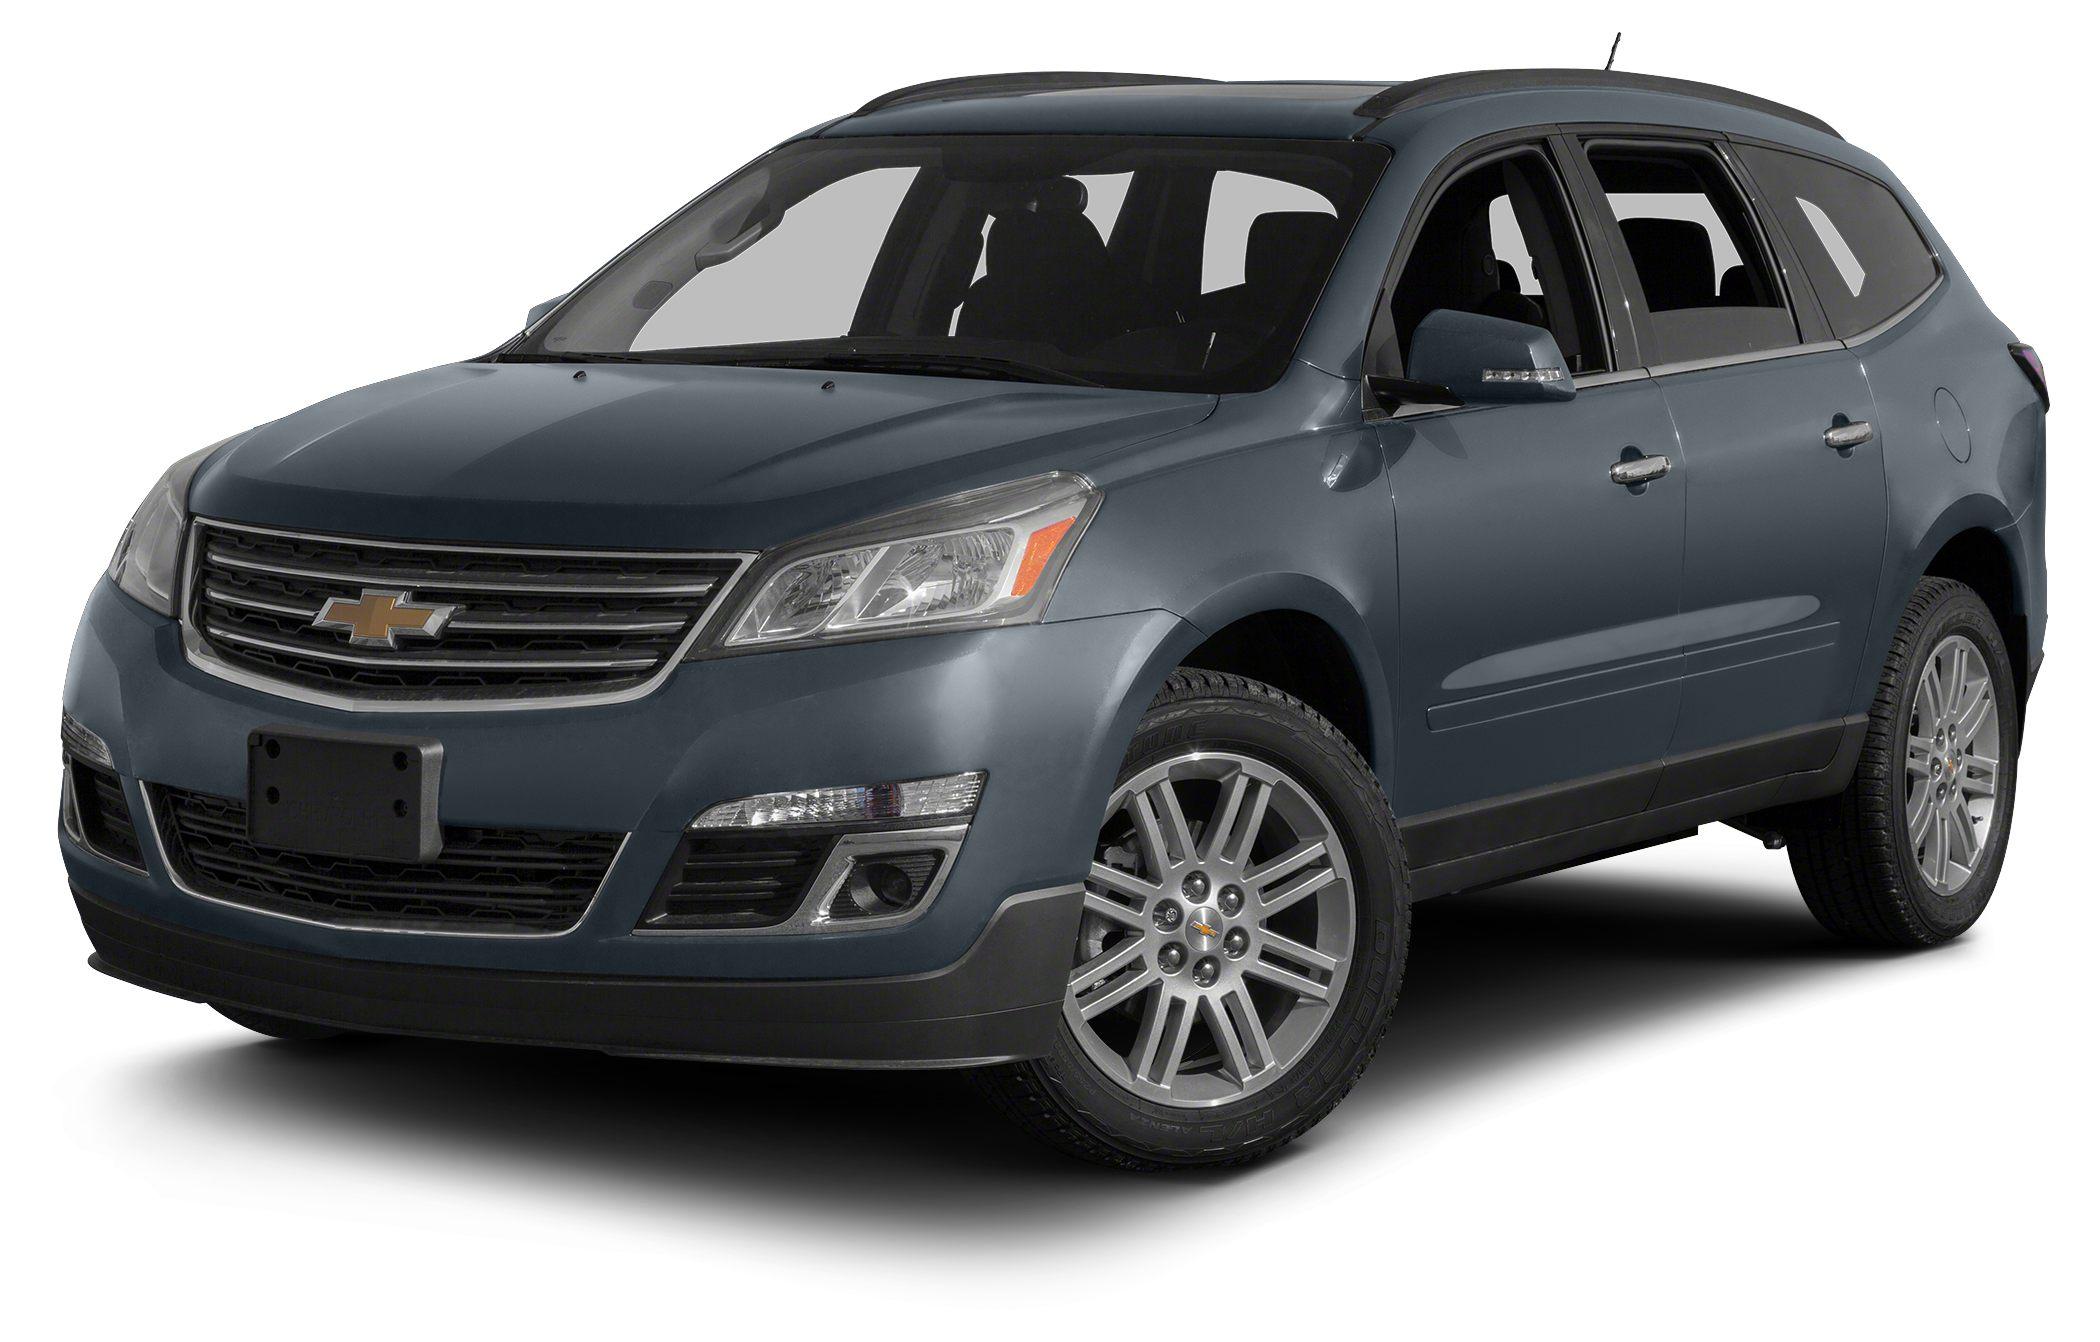 2013 Chevrolet Traverse 2LT Miles 20681Color Blue Stock 15379 VIN 1GNKRJKDXDJ181877